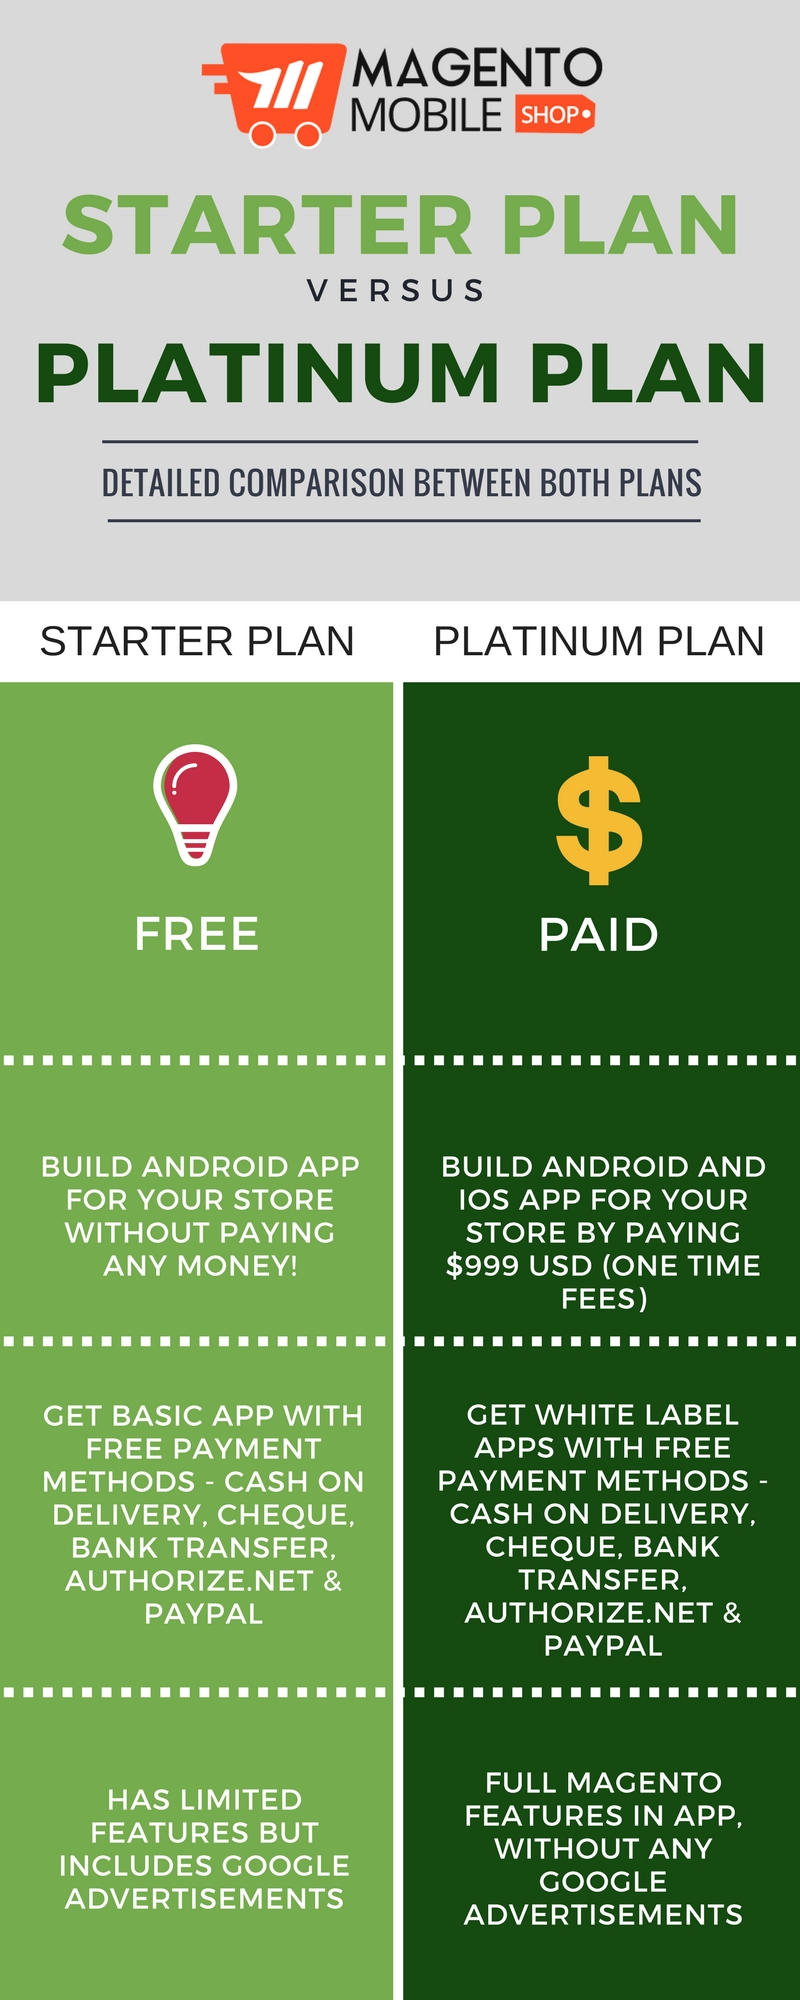 magento mobile app builder starter plan versus platinum plan